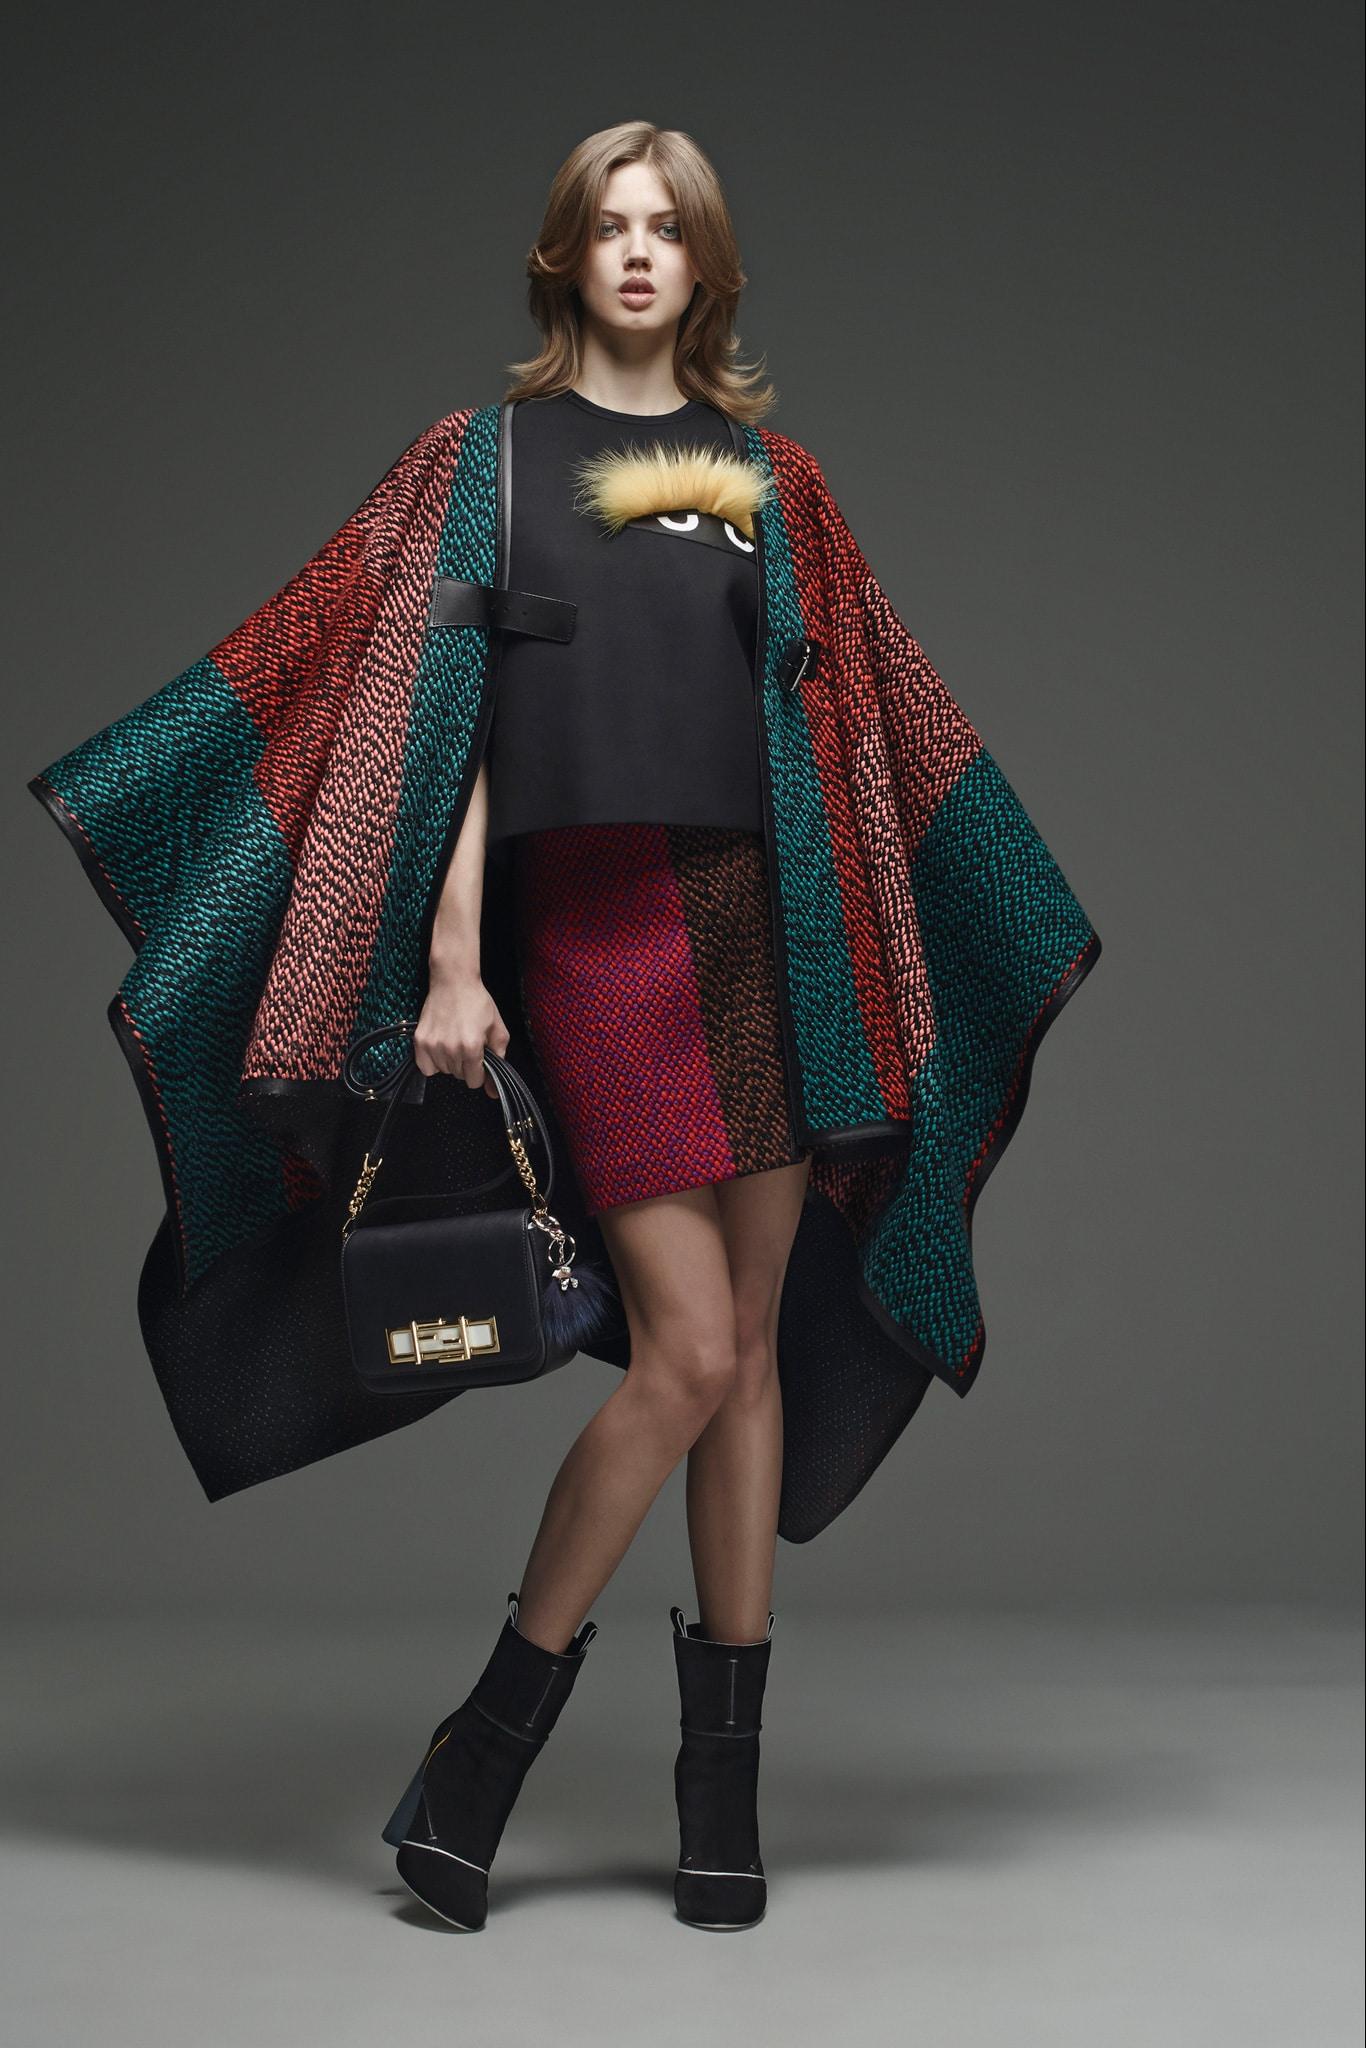 New york fashion week beauty 83